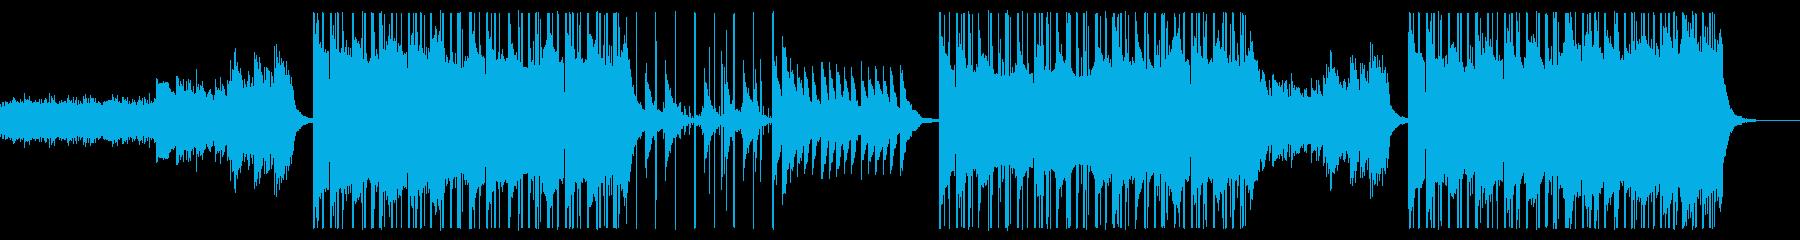 INDIE POP/切ないギターとピアノの再生済みの波形